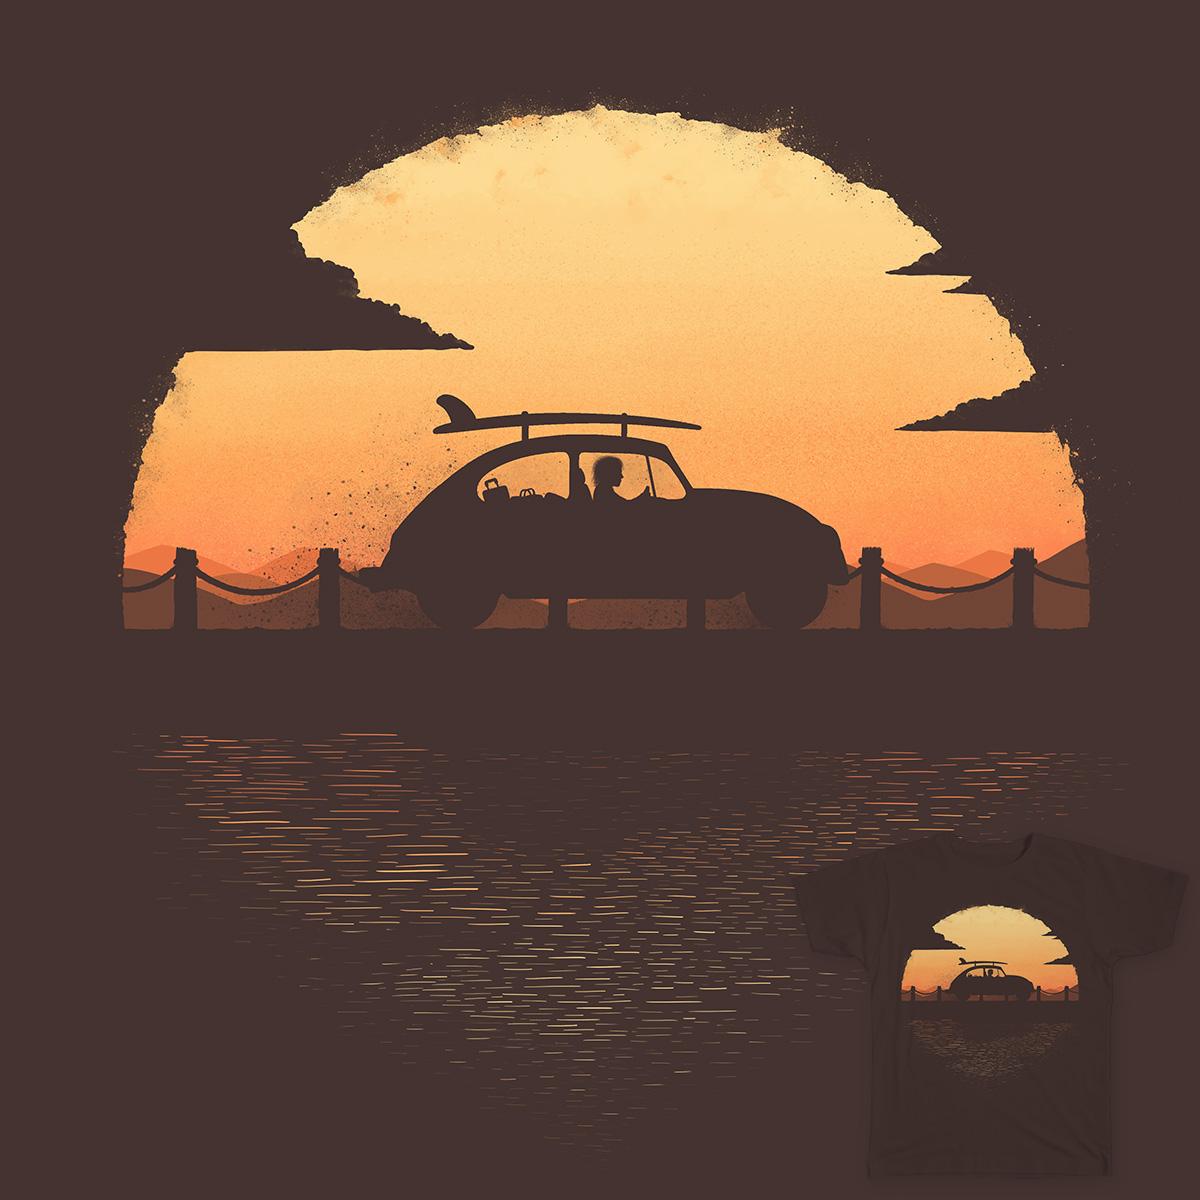 Summer Trip by martinosimani2 on Threadless